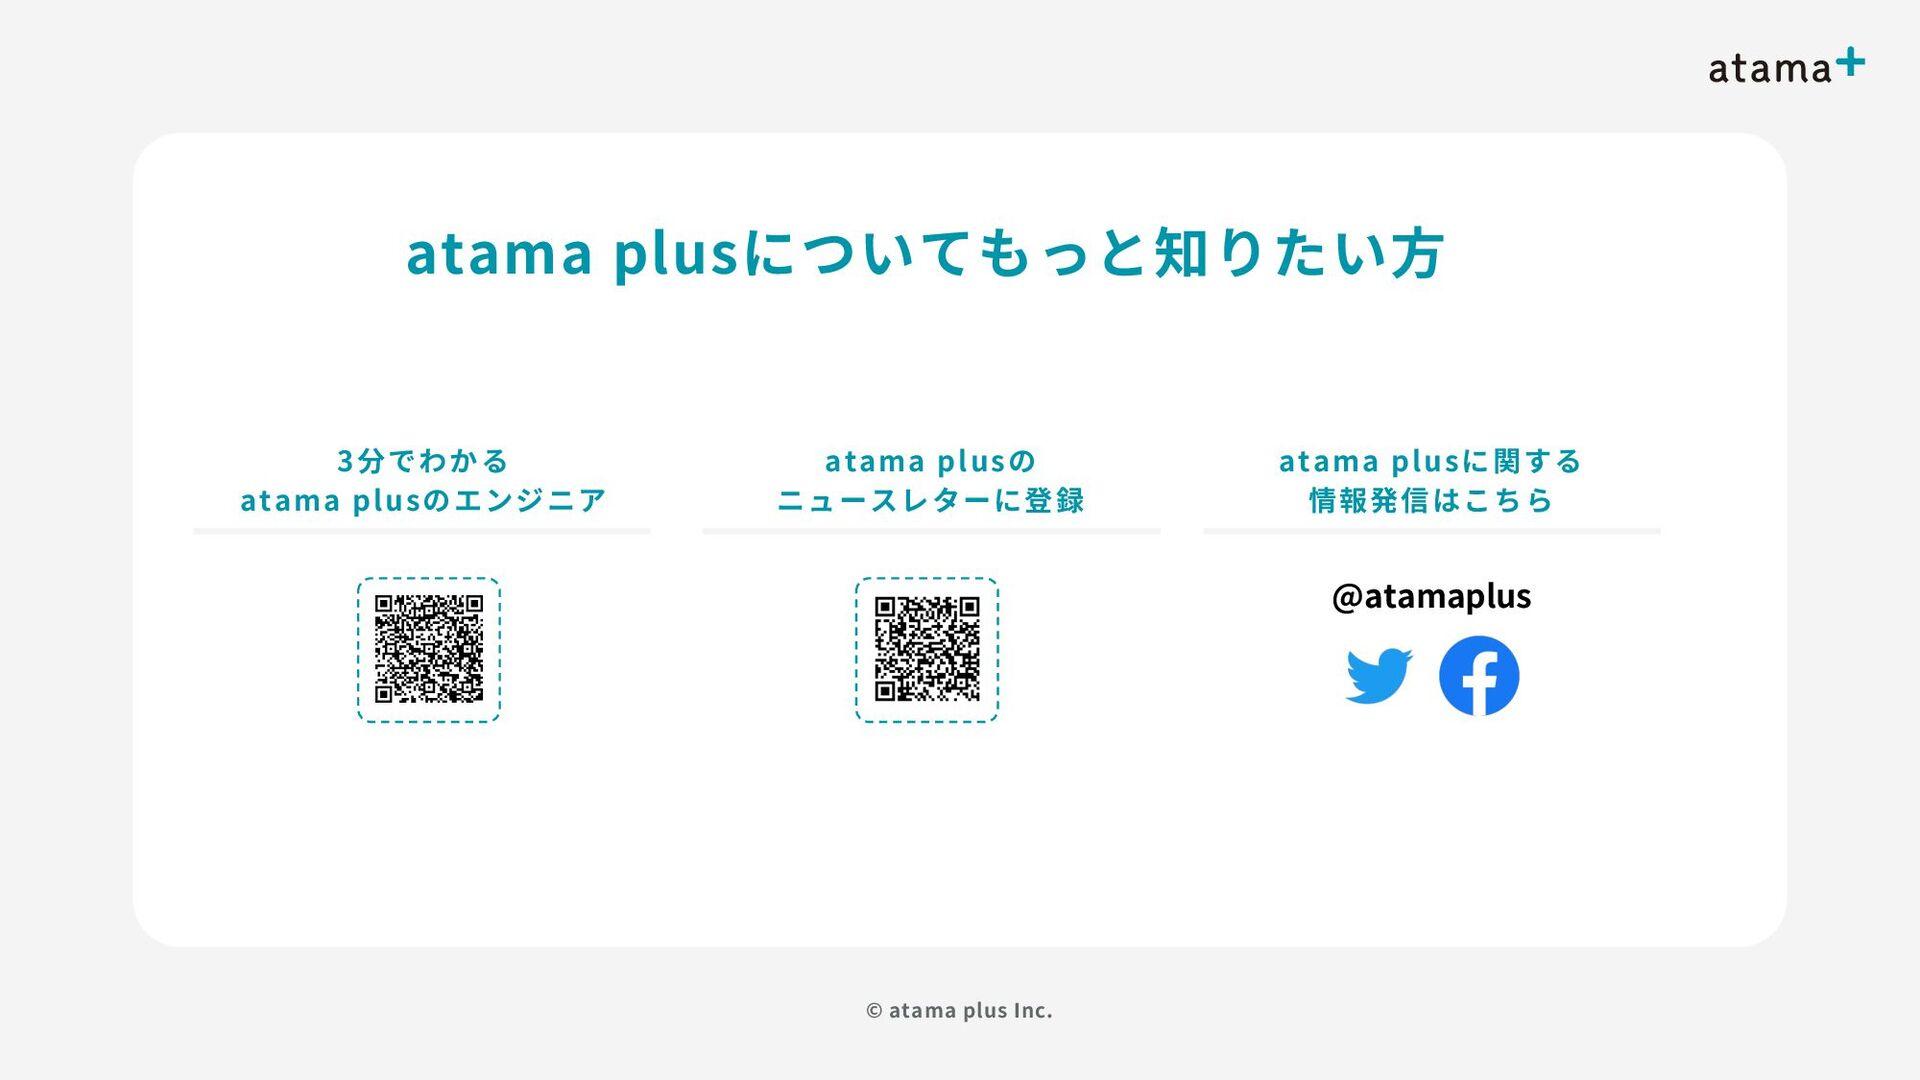 atama plusを楽しめる仲間 05 採用について 50 ・事業を通して社会をよくしたい ...